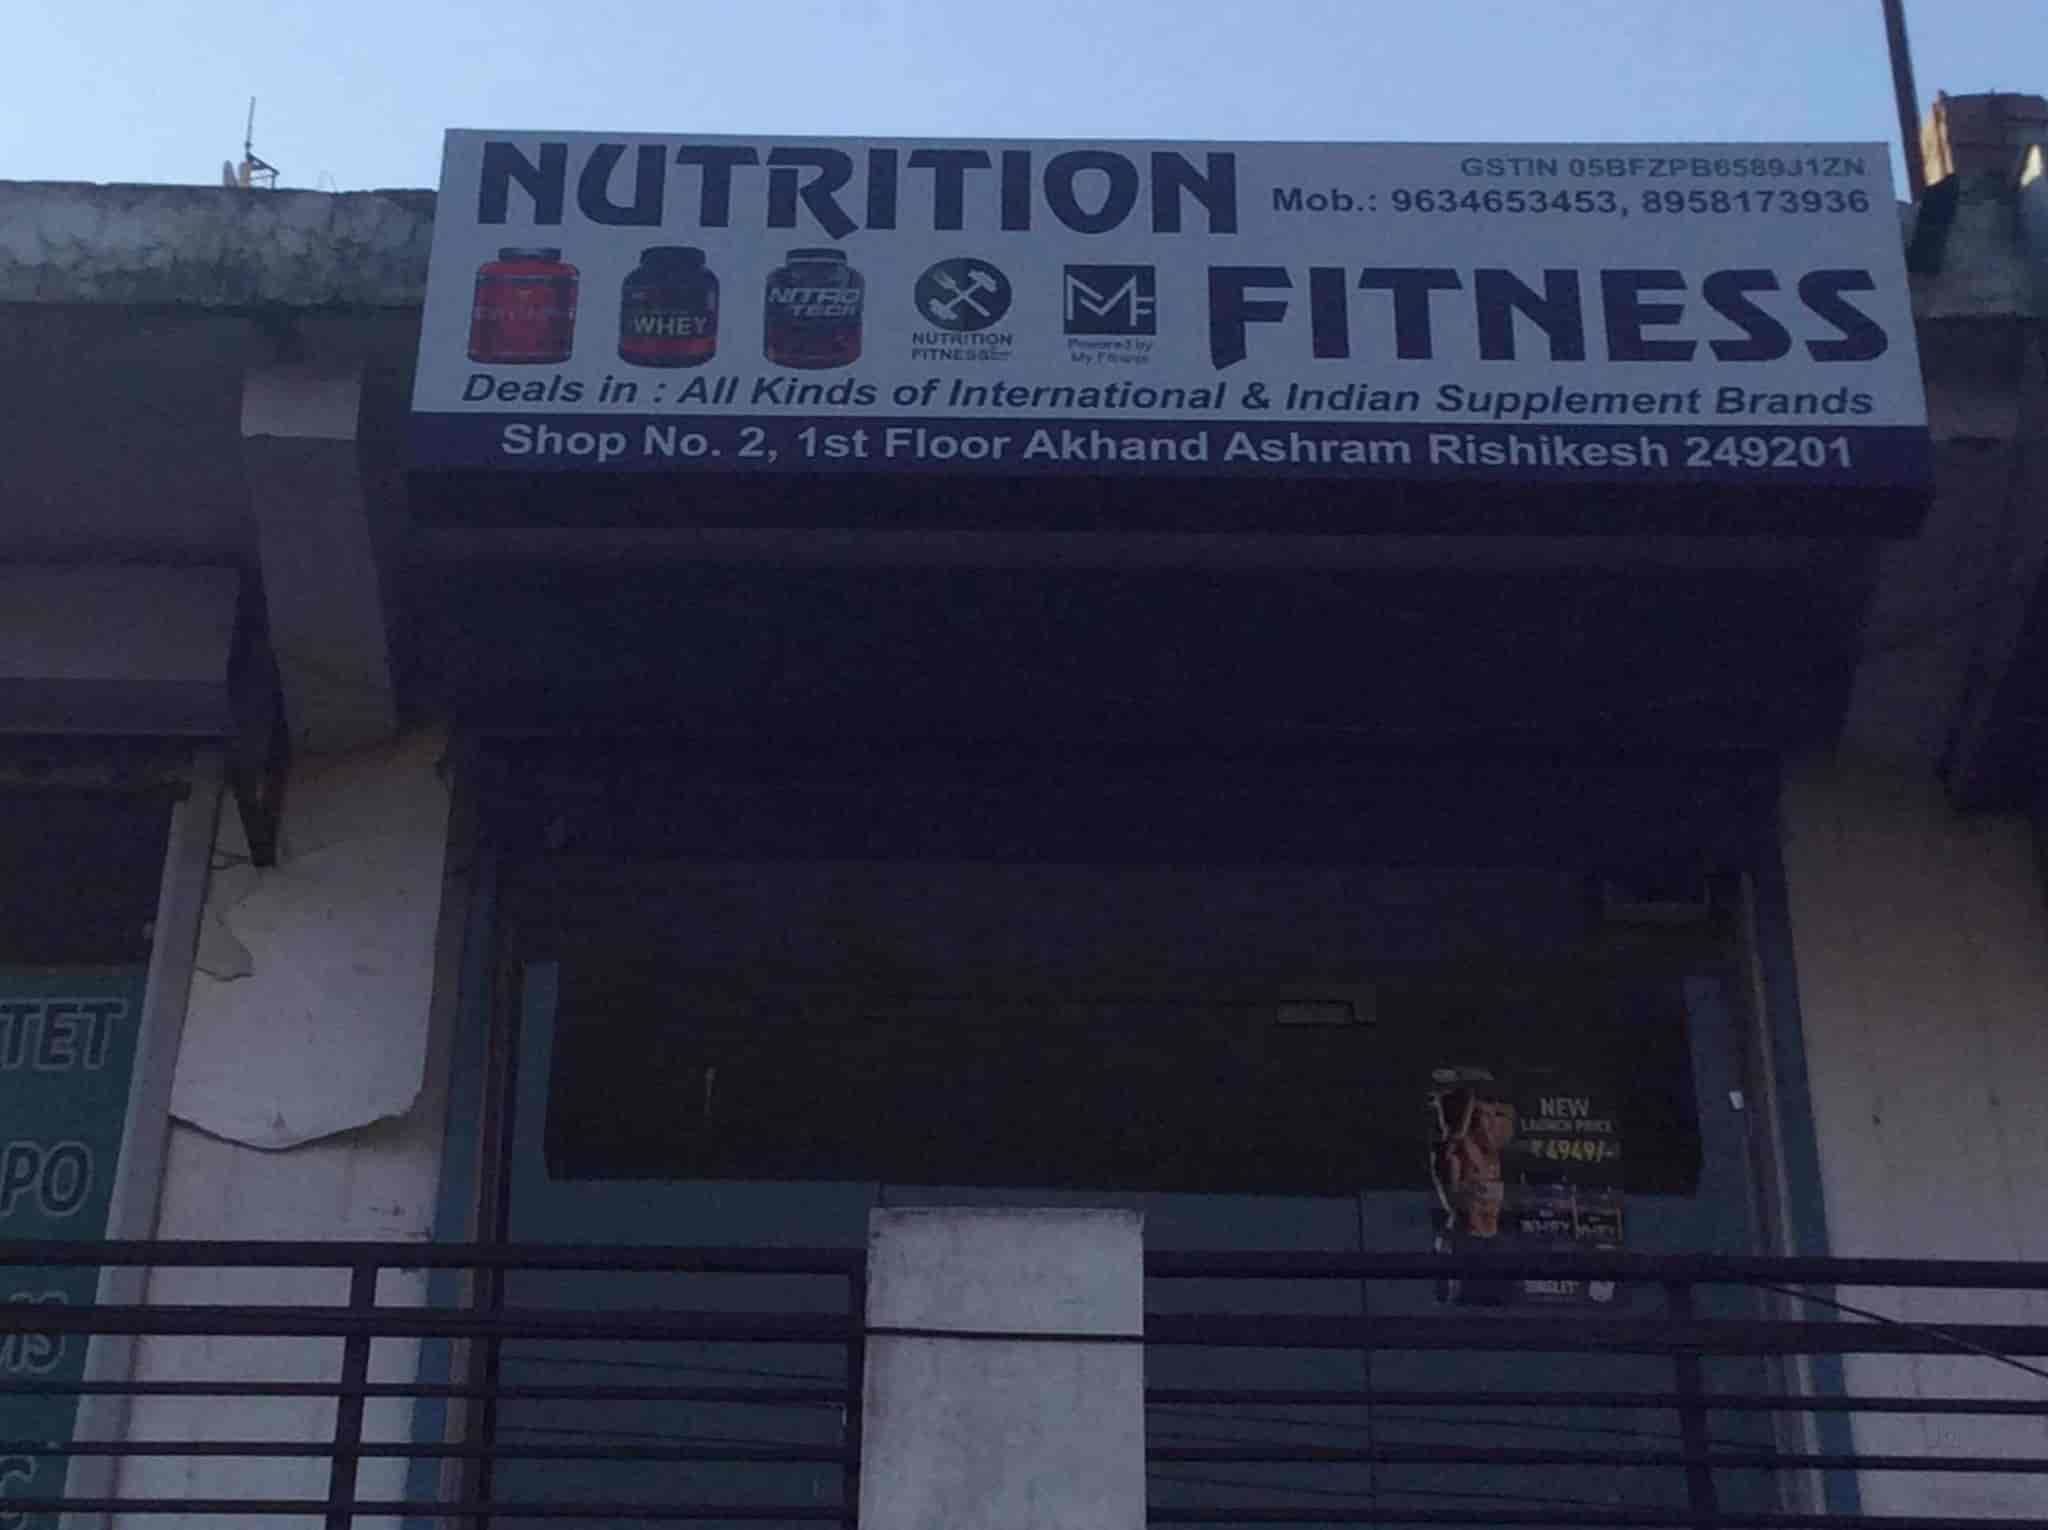 nutrition fitness photos